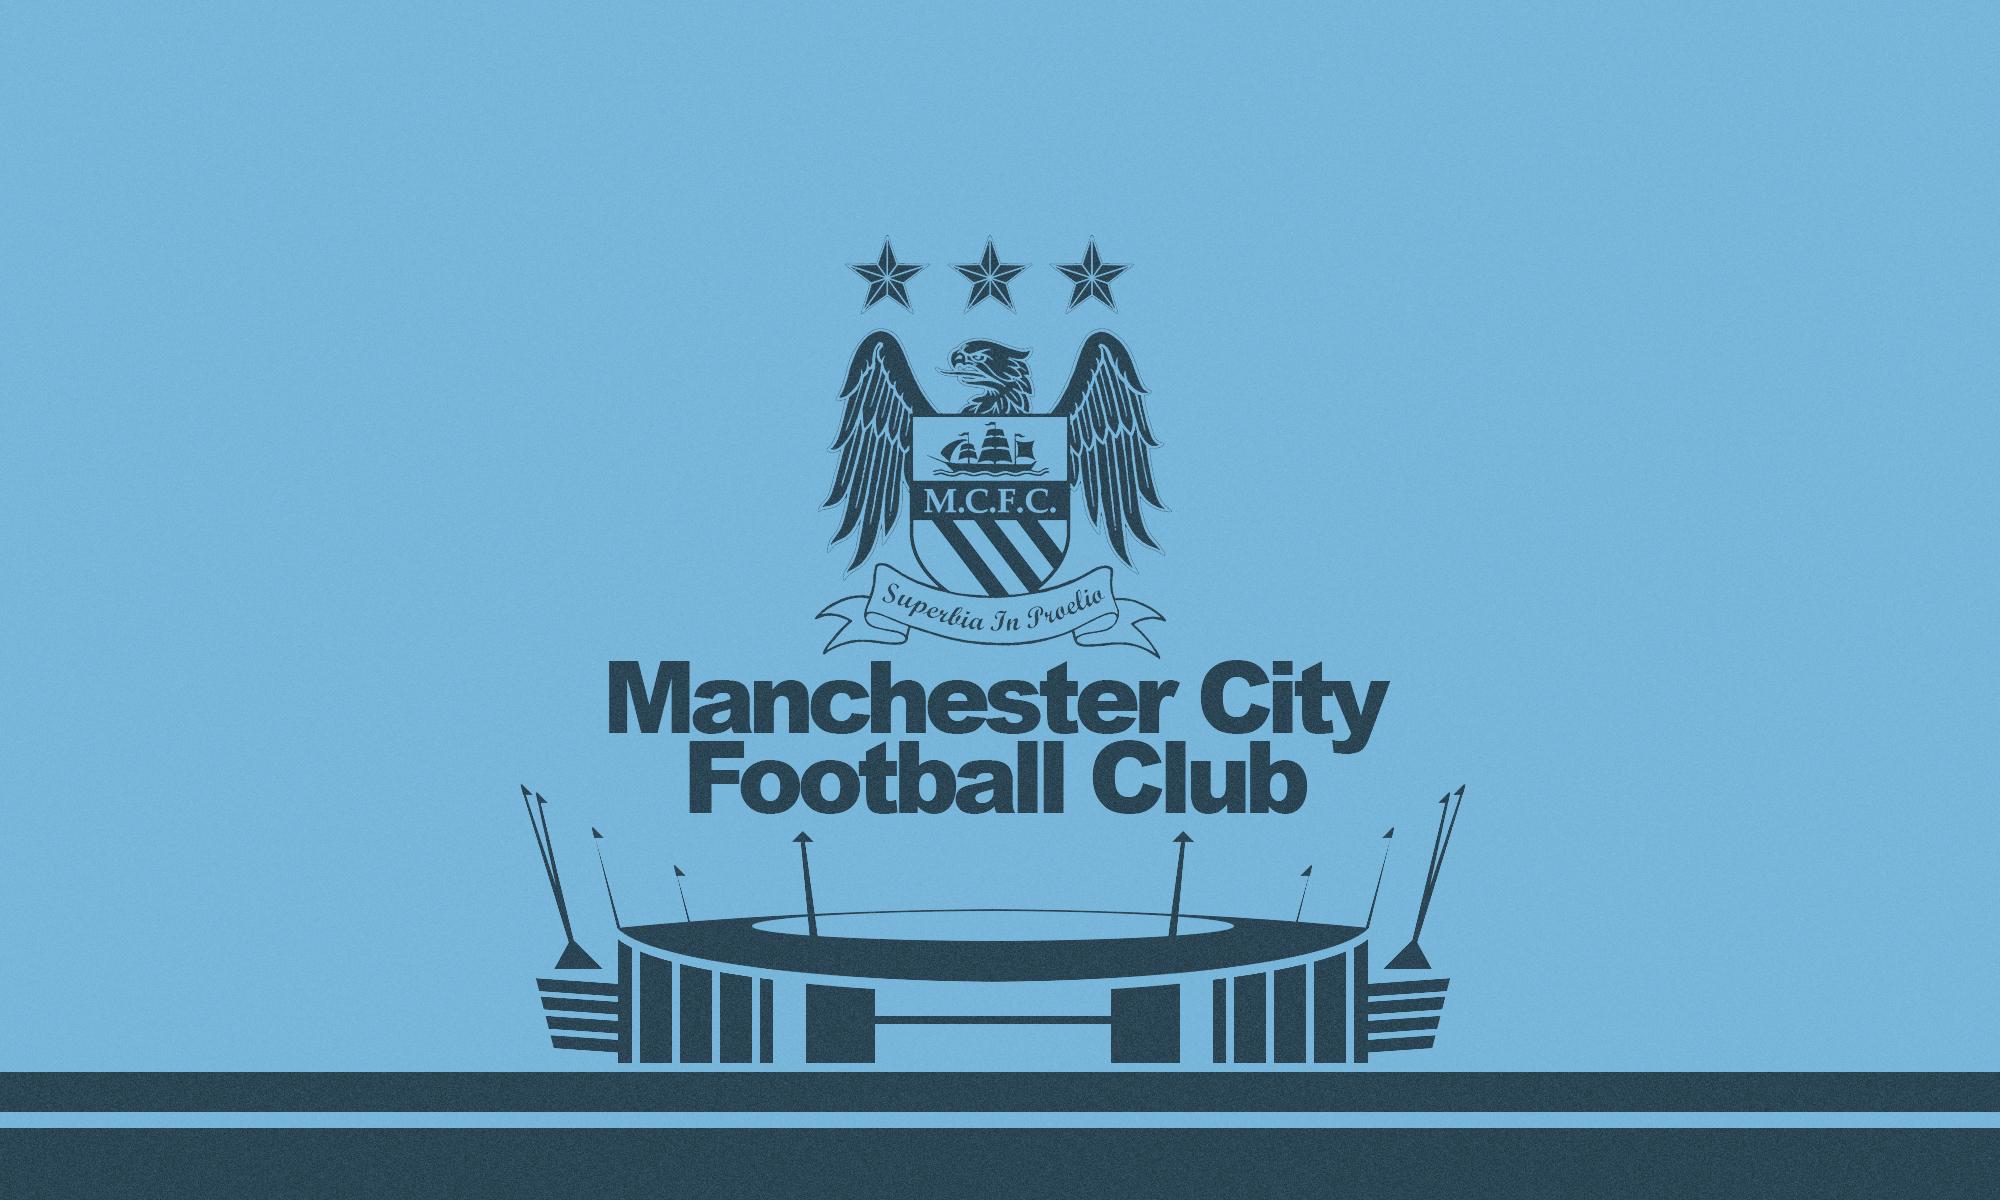 Manchester City Logo Wallpaper 2014 Background HD Wallpaper for 2000x1200